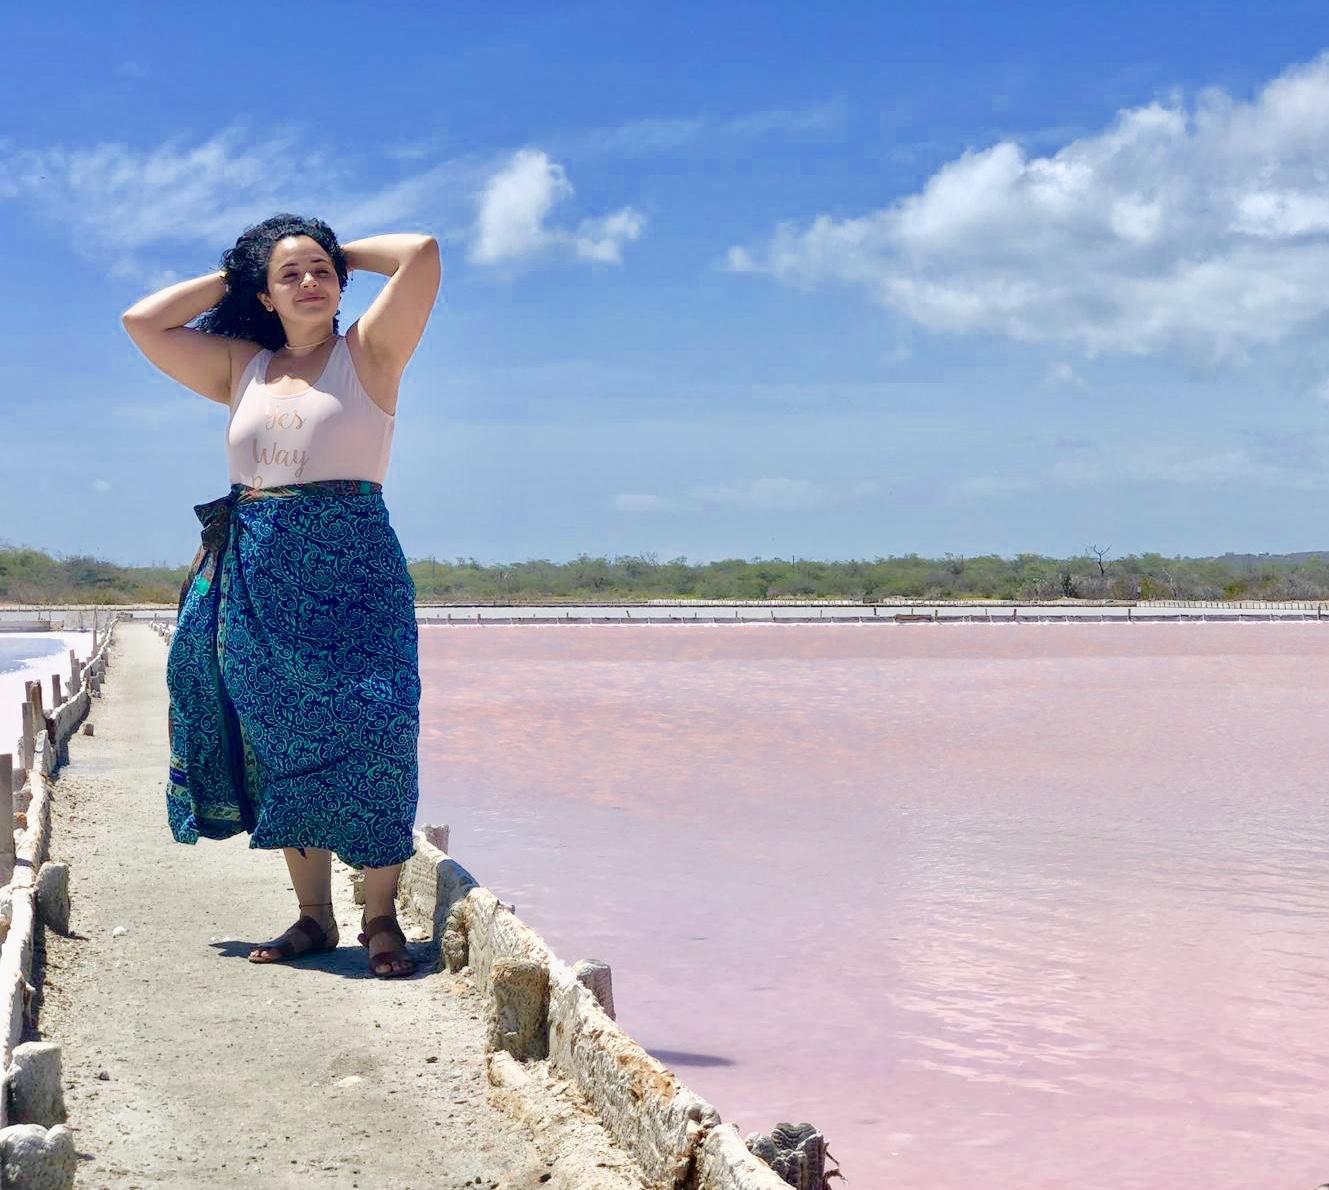 dia veraniego con sari skirt en playa rosada